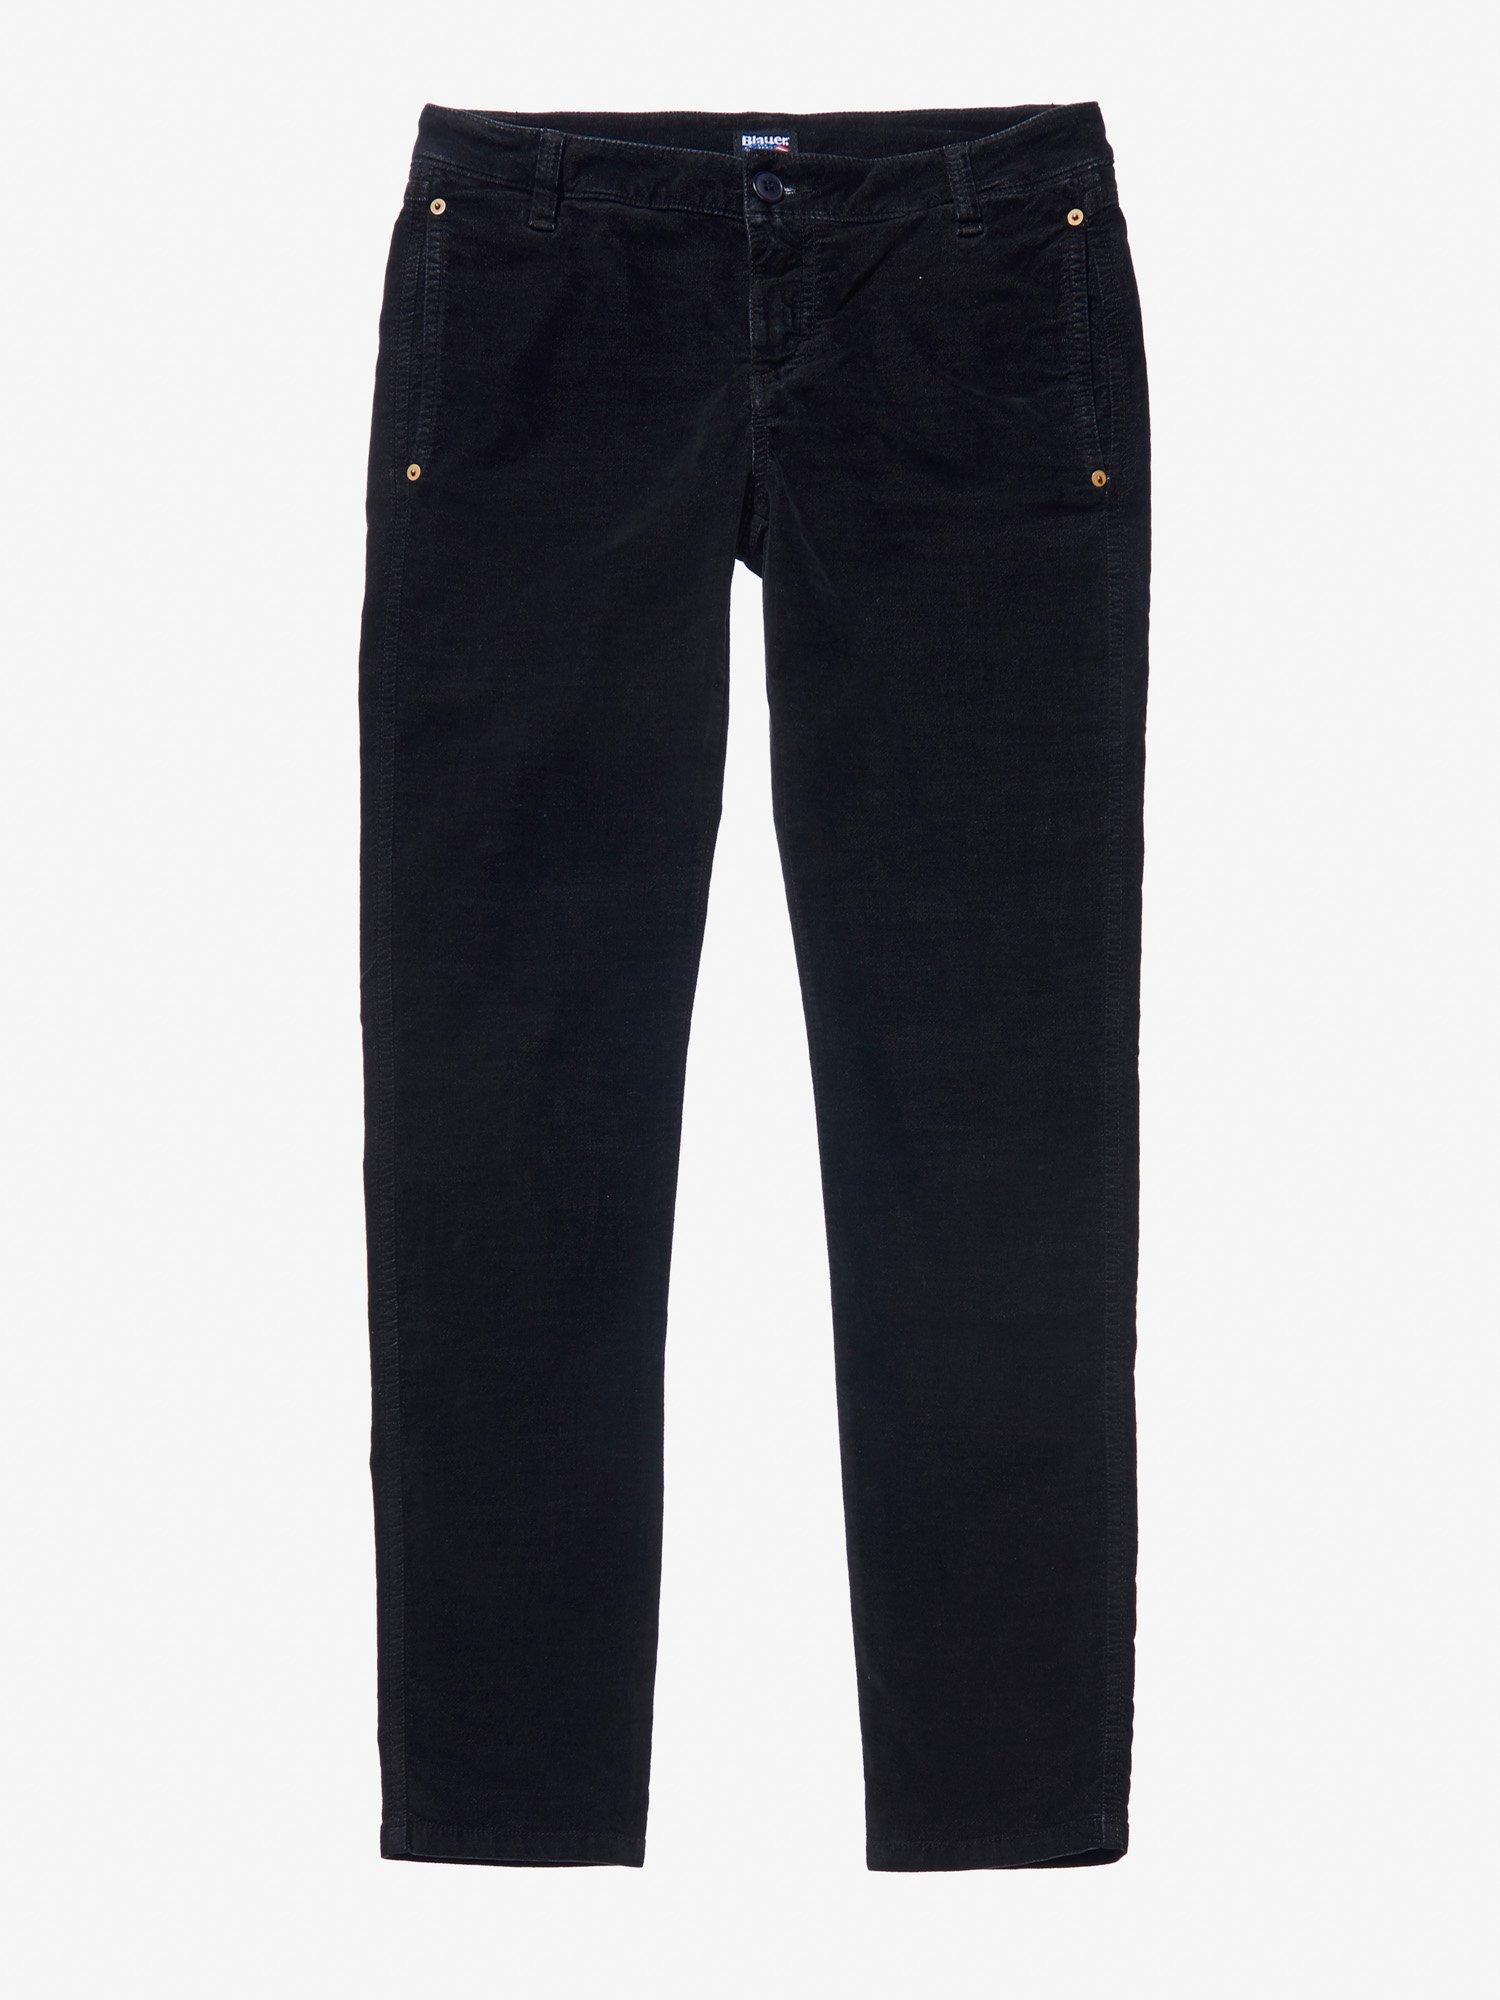 Blauer - FINE WALE CORDUROY PANTS - Black - Blauer